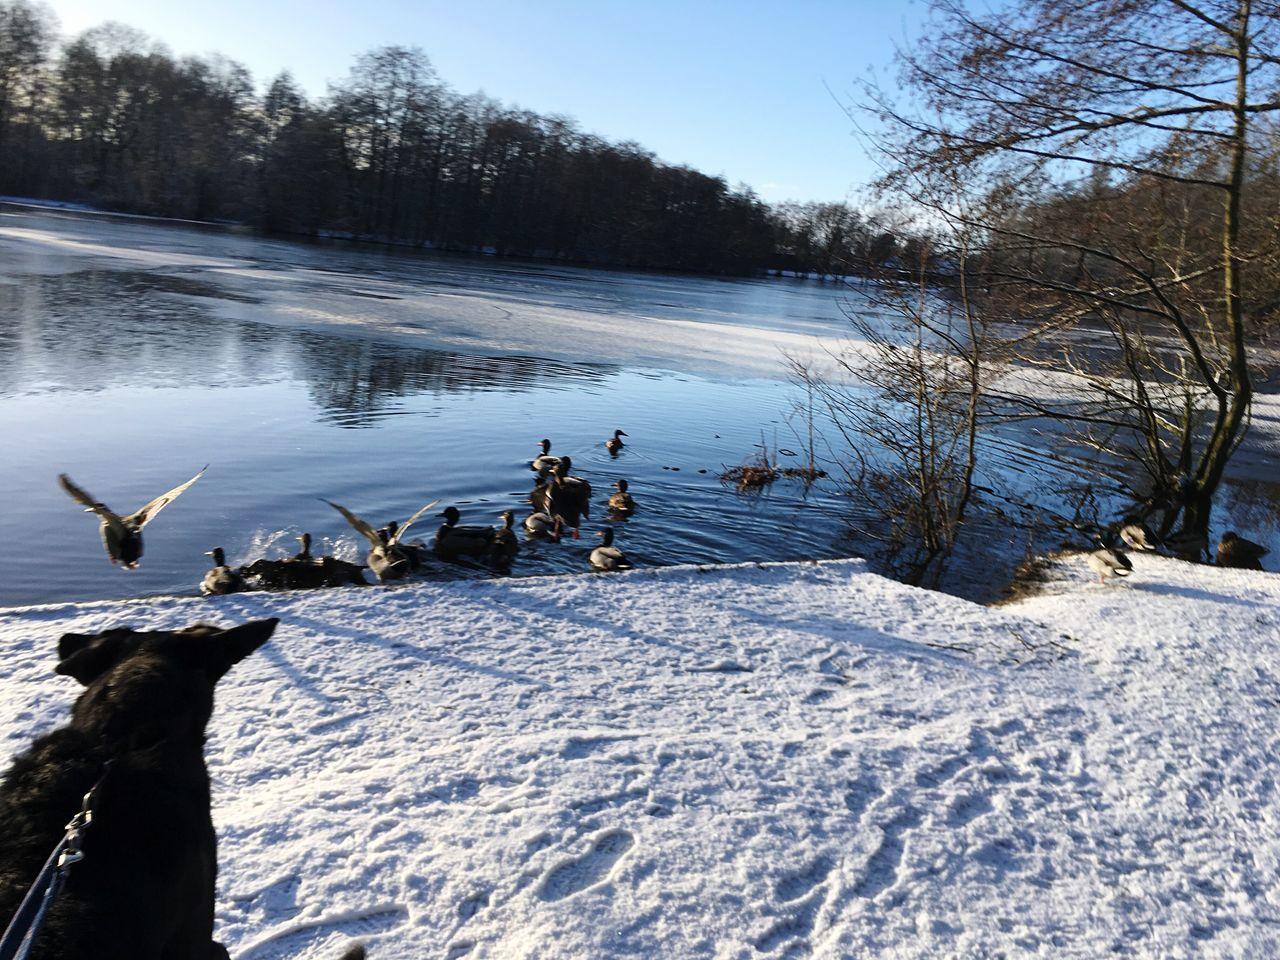 No People Oldenburg Running Dog Shaky Cam Scaring Ducks Sky Water Lake Winter Nature